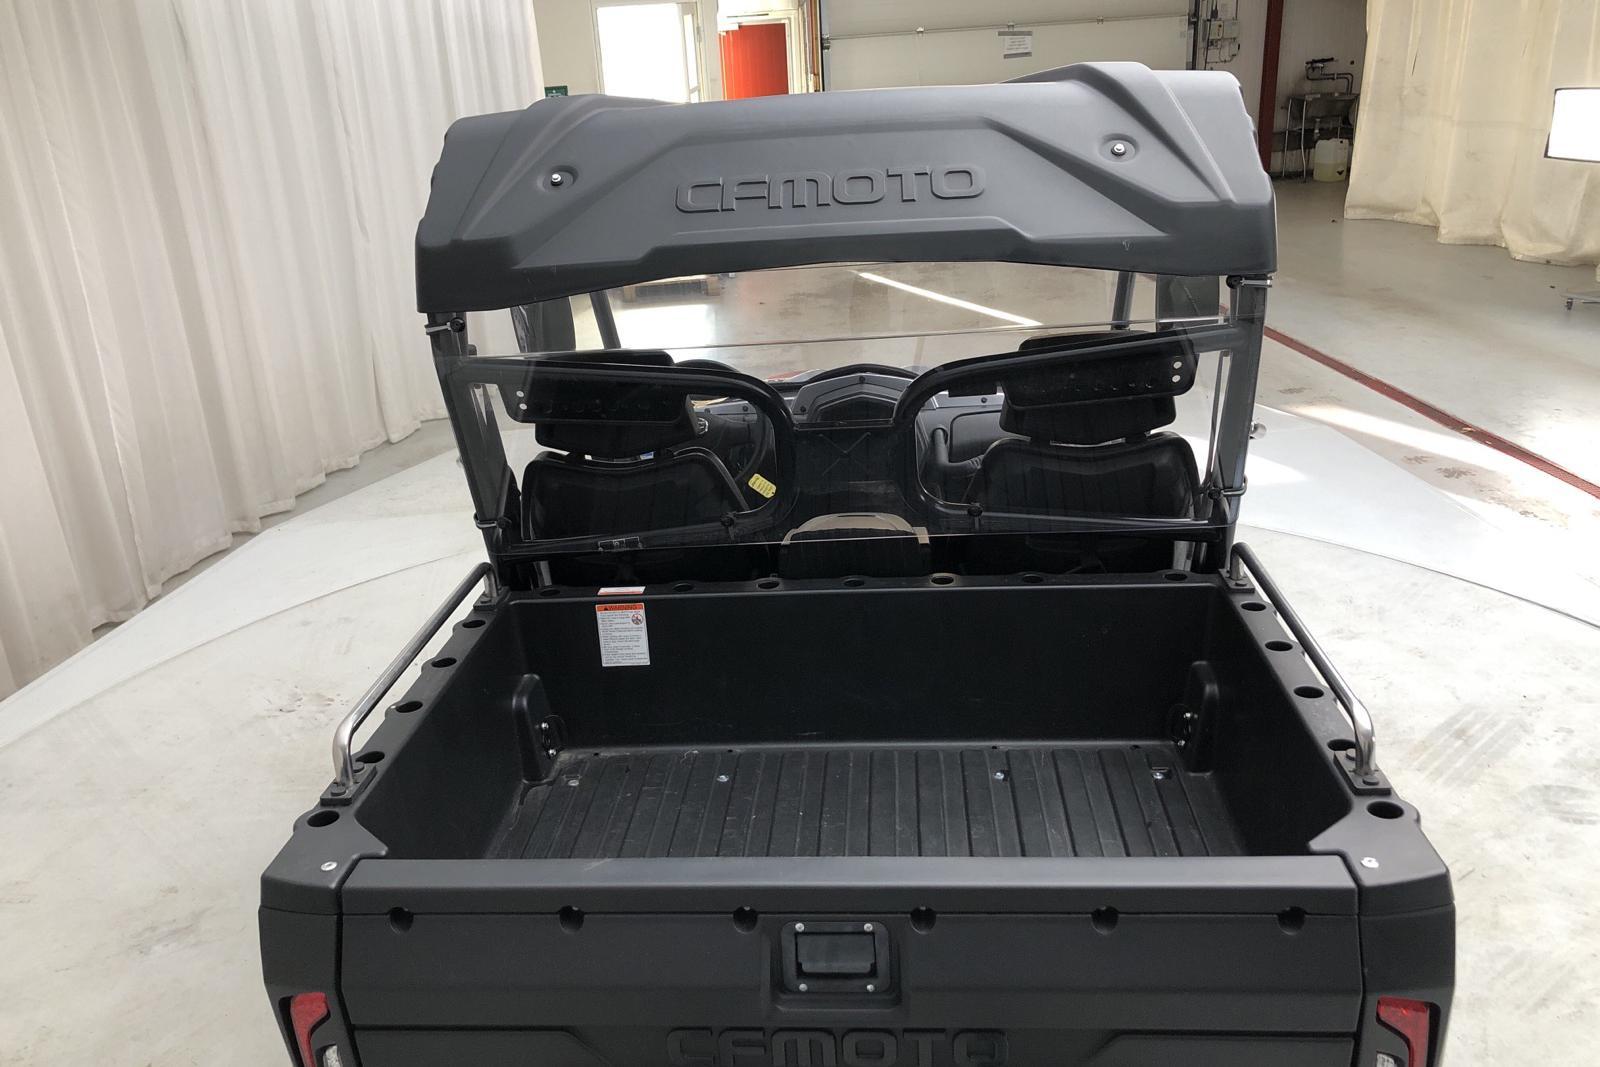 CFMOTO UFORCE 800 EFI UTV - 0 km - gray